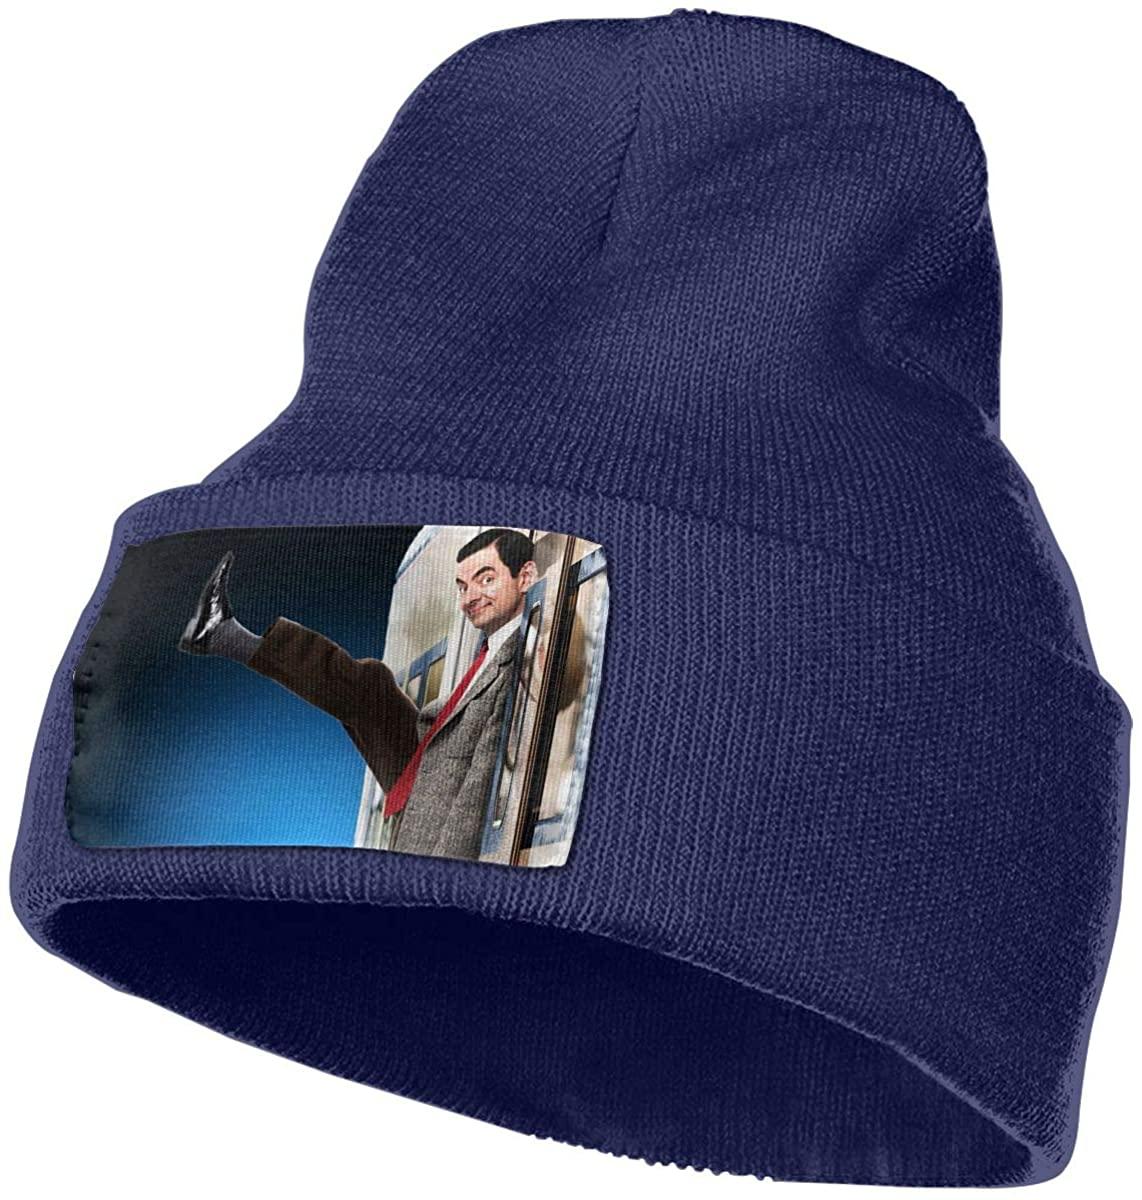 Mr. Bean Unisex Fall Winter Warm Knit Cap Beanie Hat Stretchy Ski Cap, 18x30 cm Navy